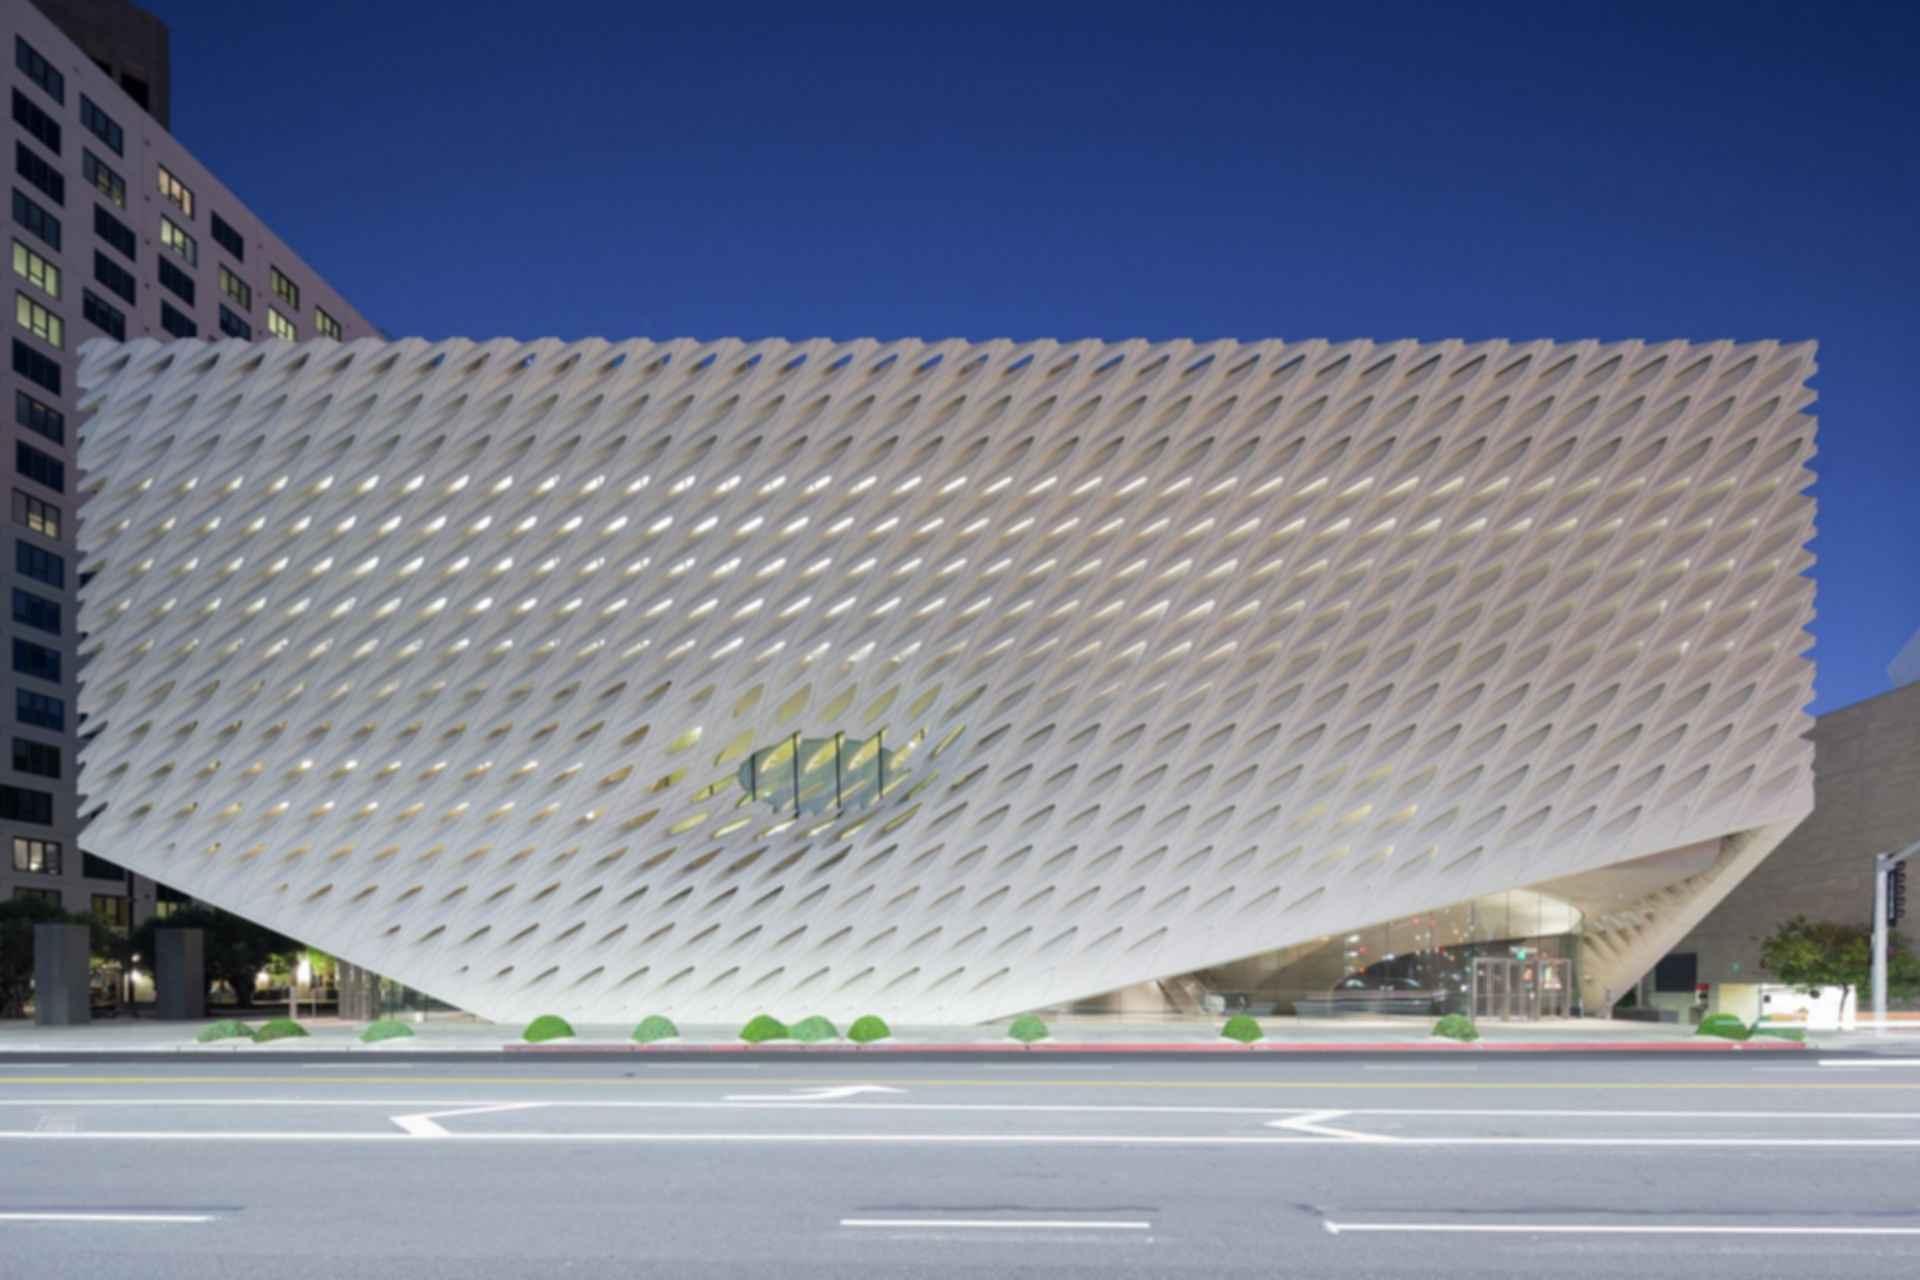 The Broad Museum - Concept Design/Exterior